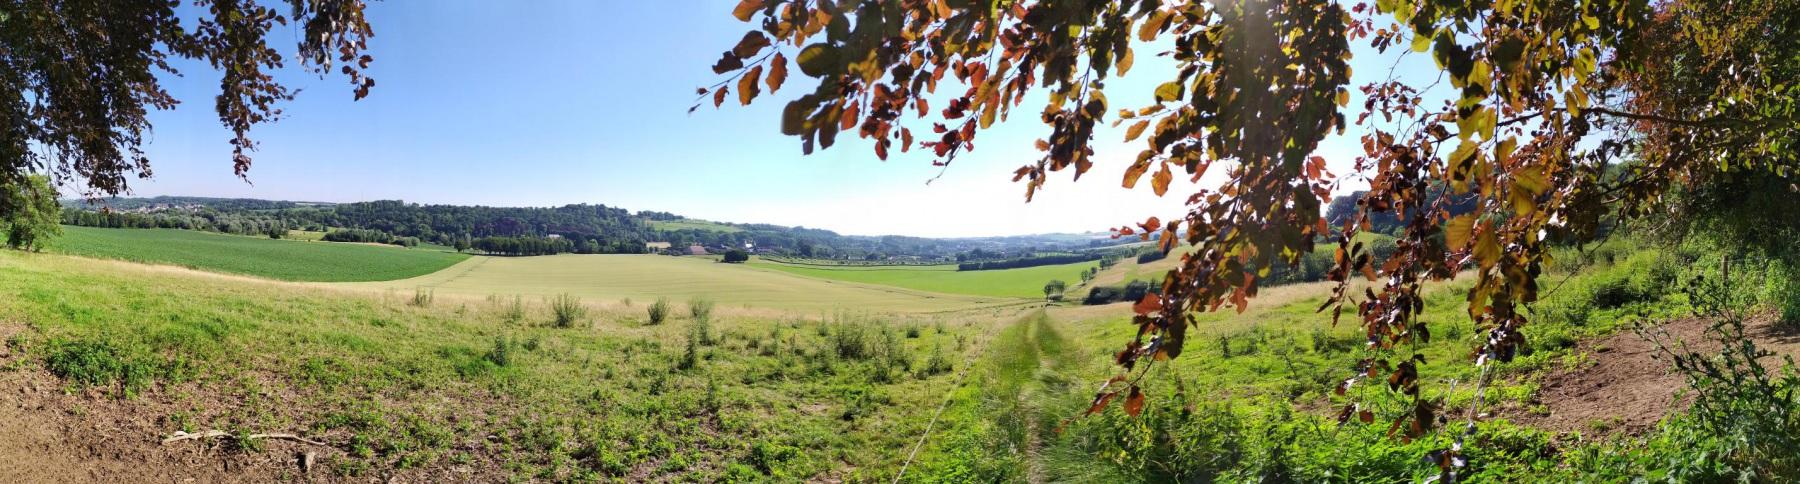 Wandeling-Valkenburg-kastelen-34